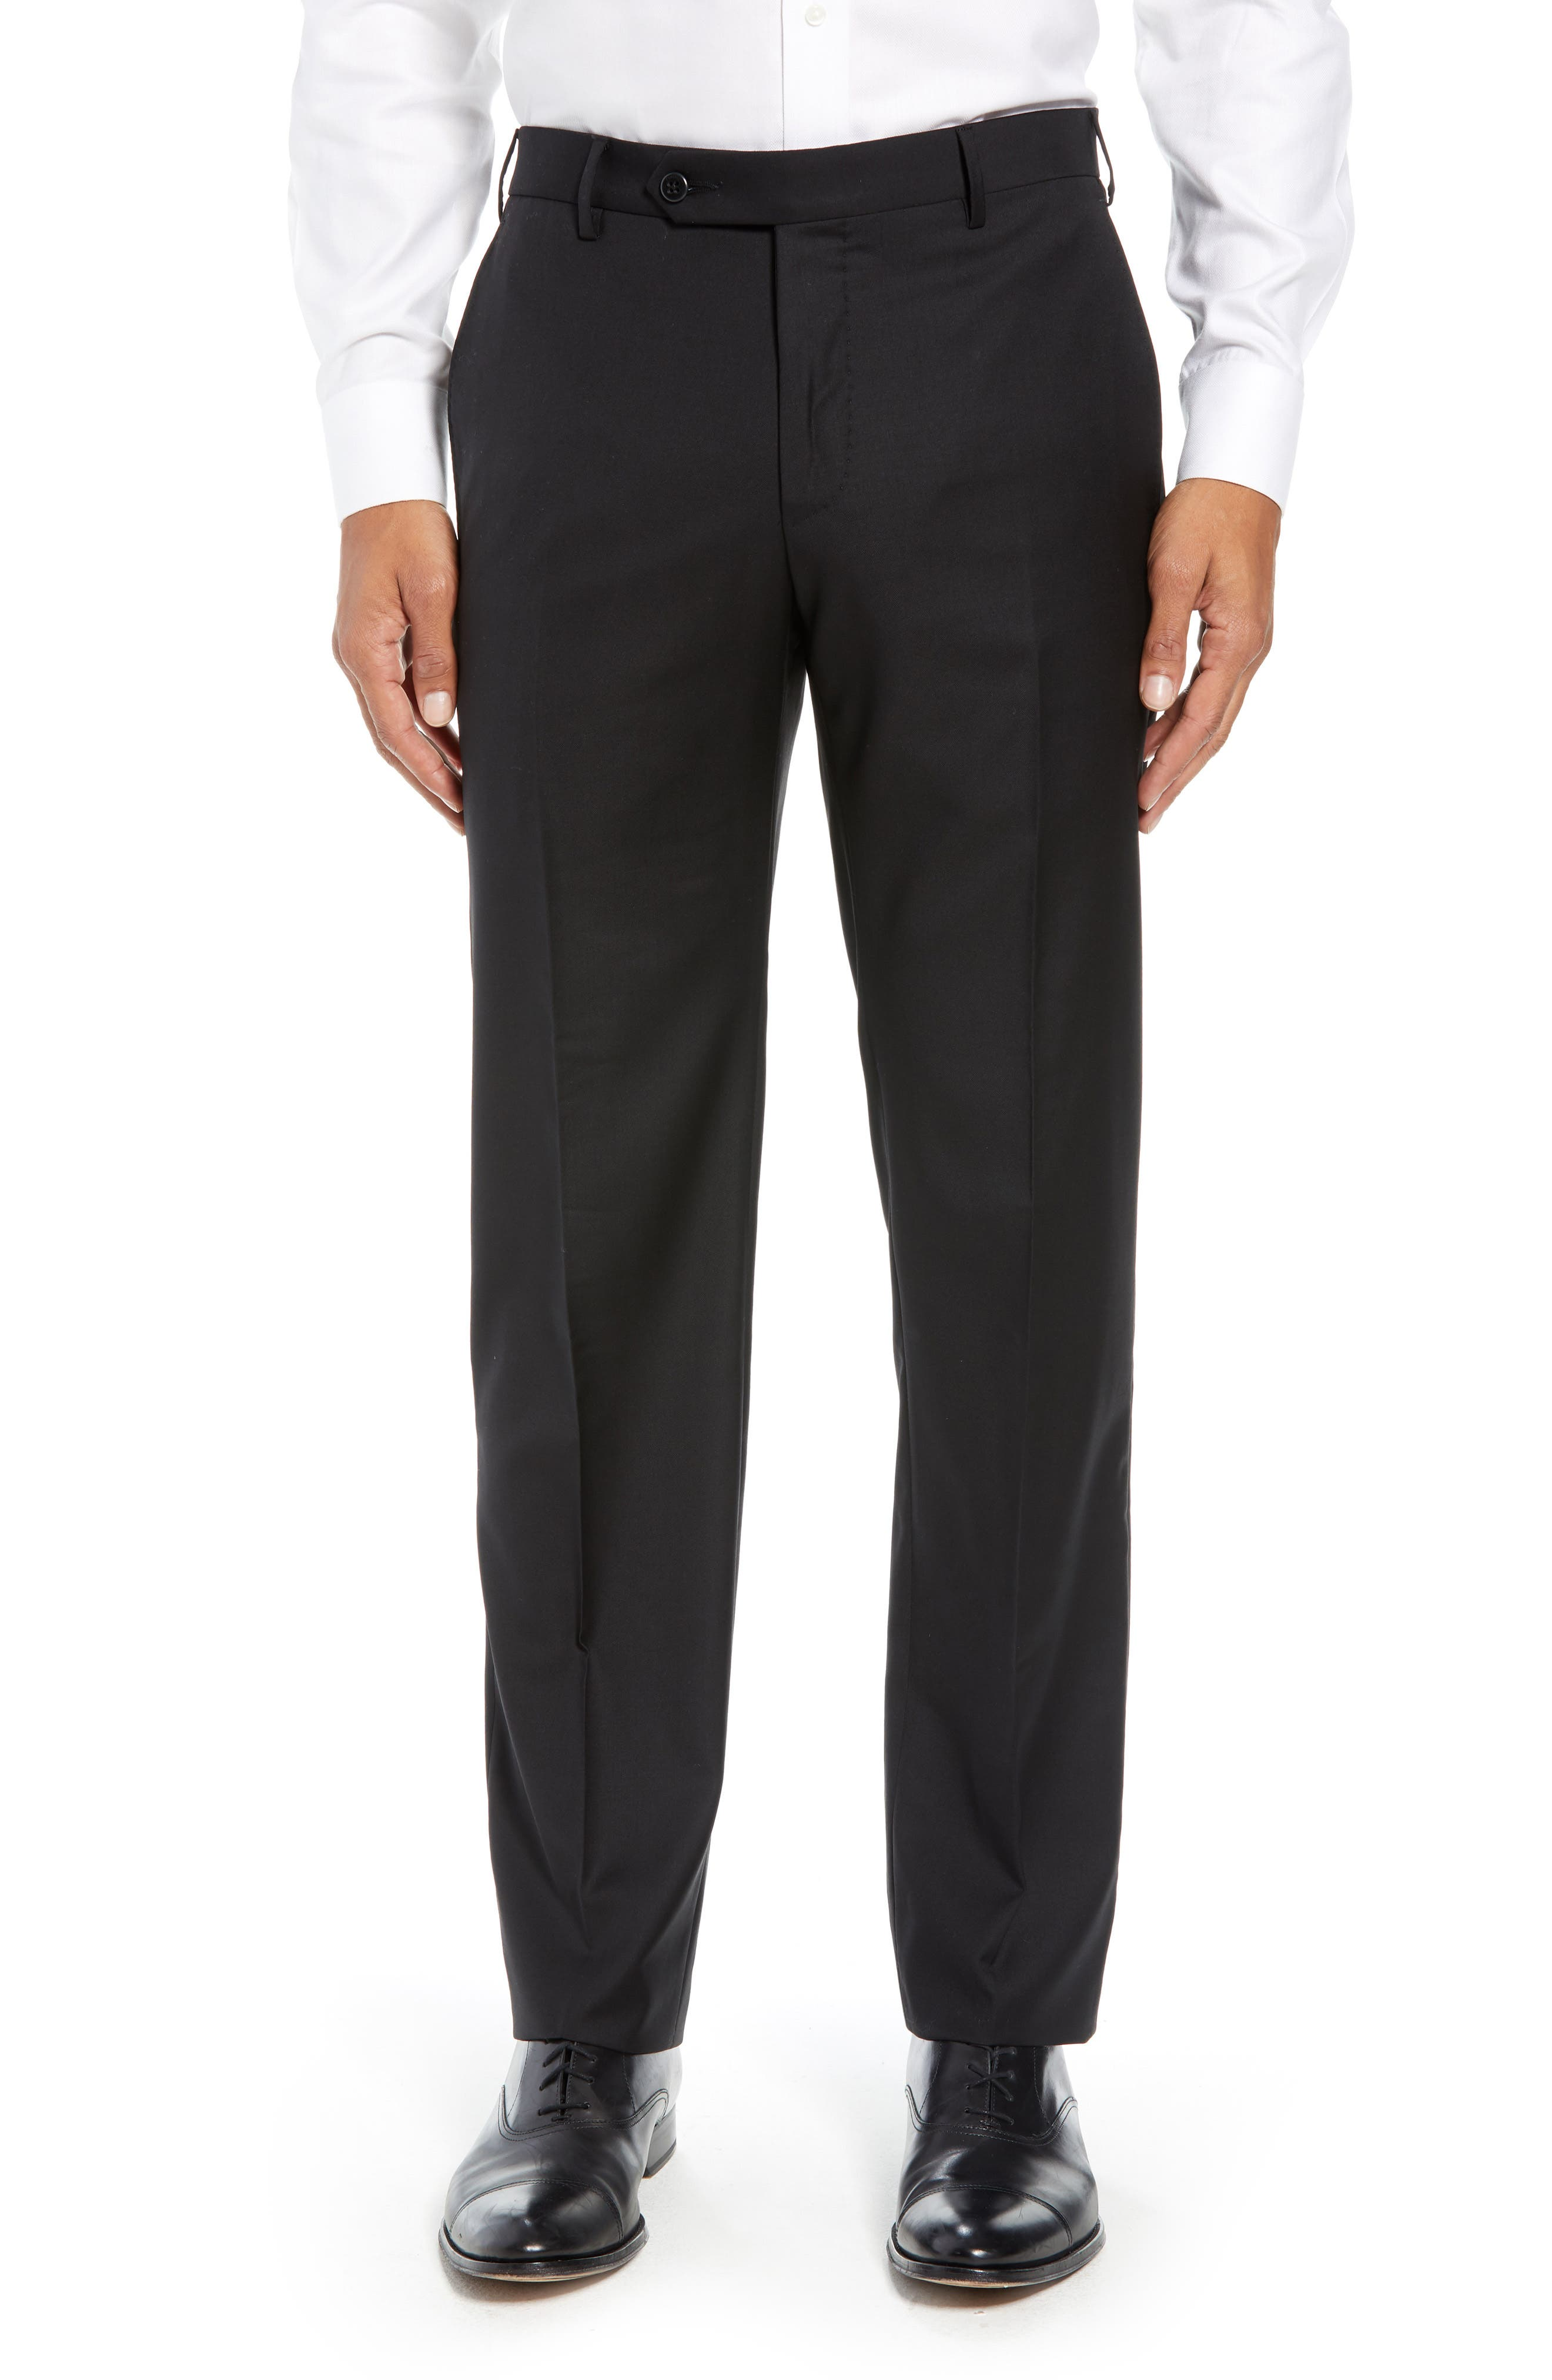 ZANELLA Parker Flat Front Solid Wool Trousers in Black